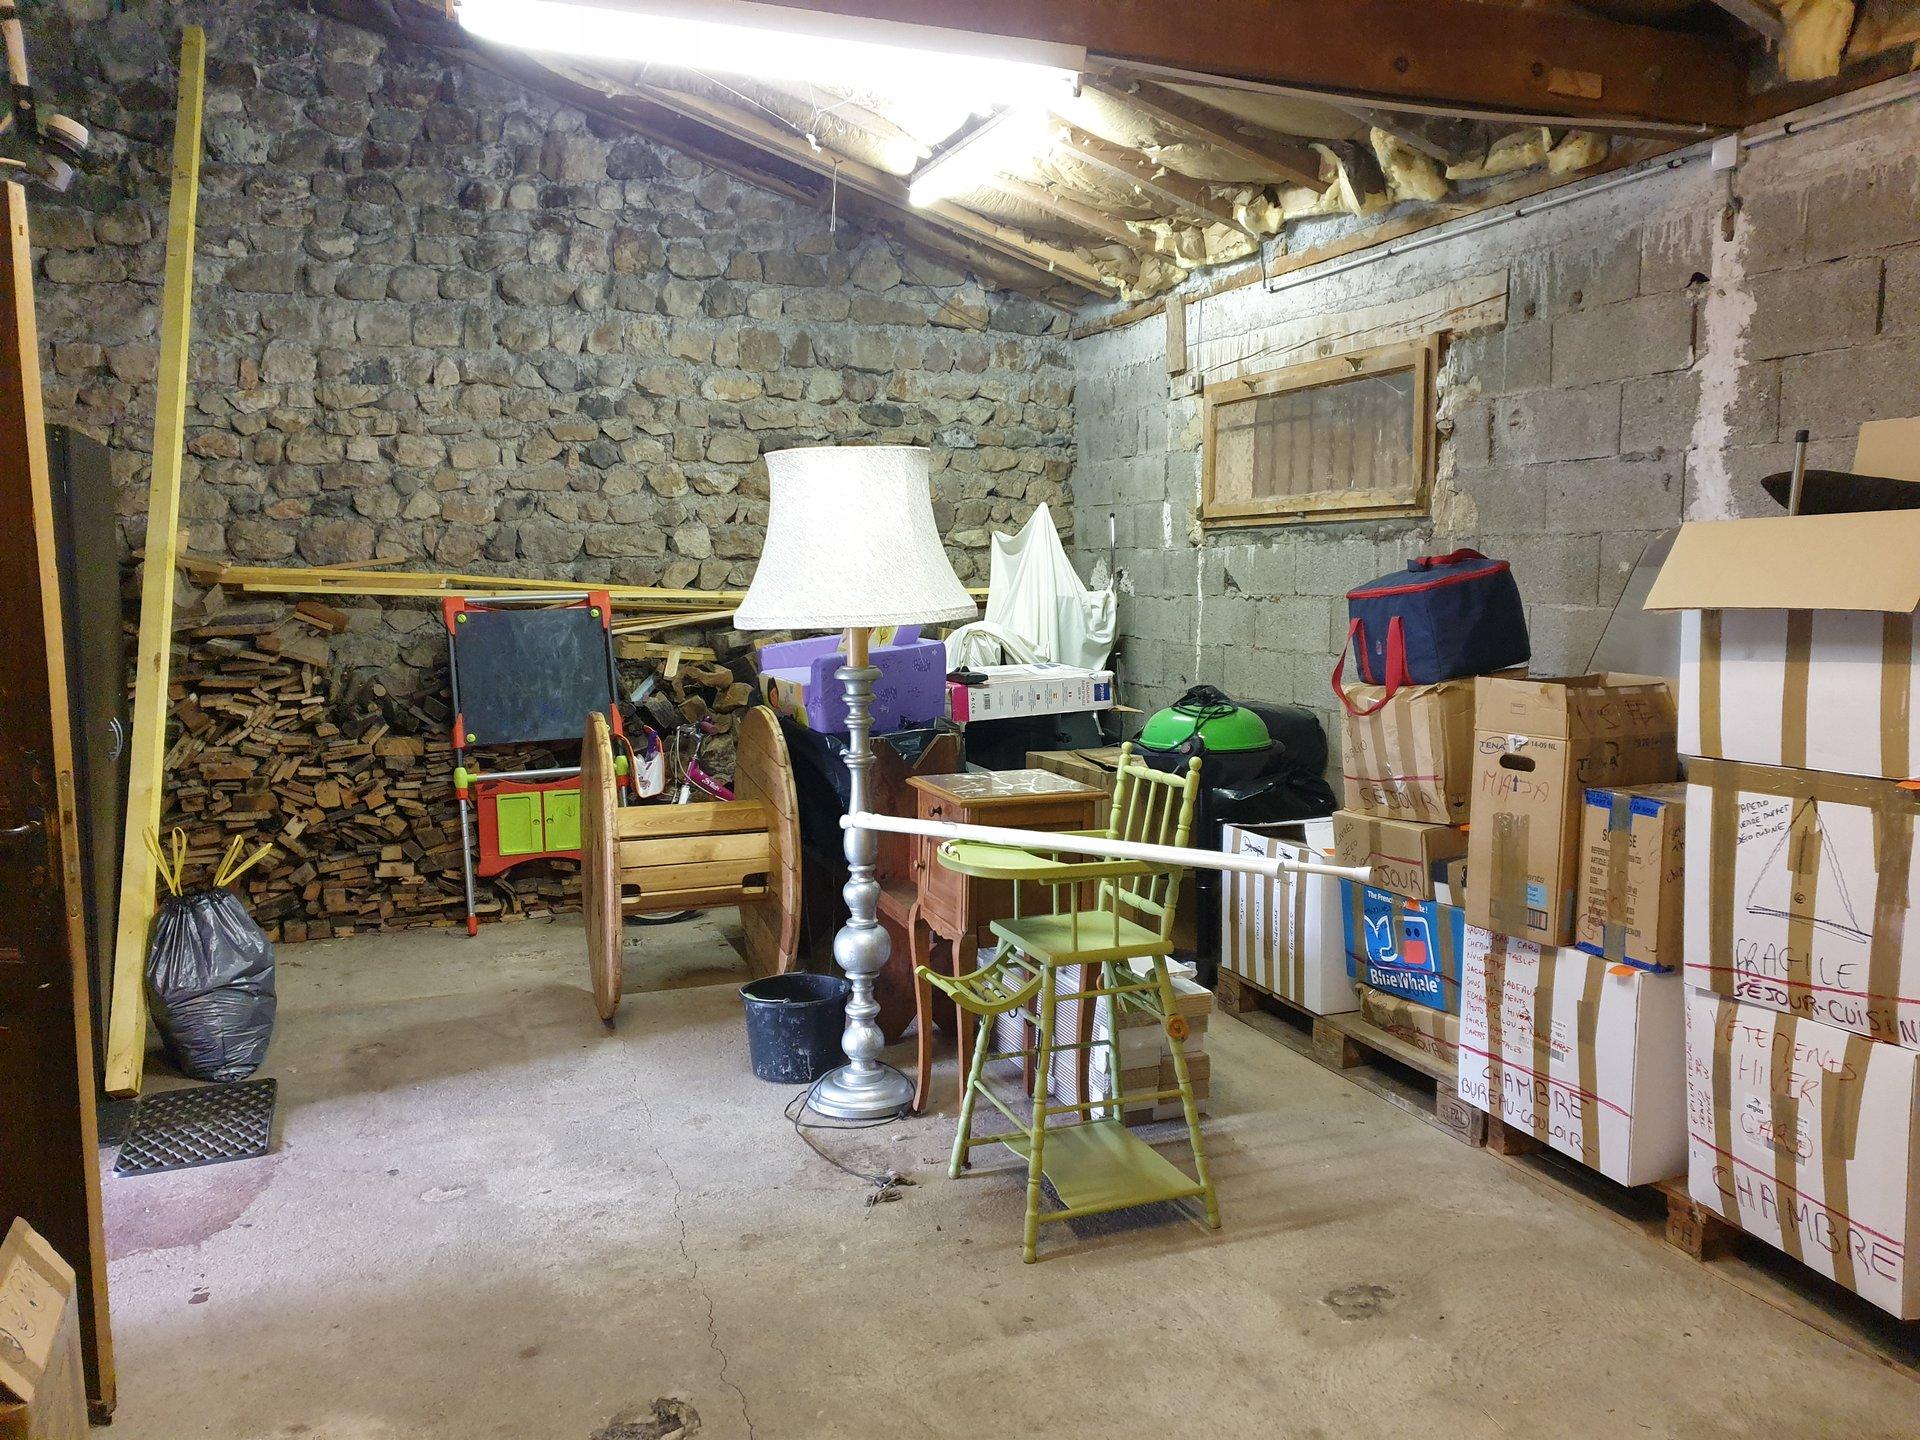 Sale Apartment - St Etienne Lardeyrol